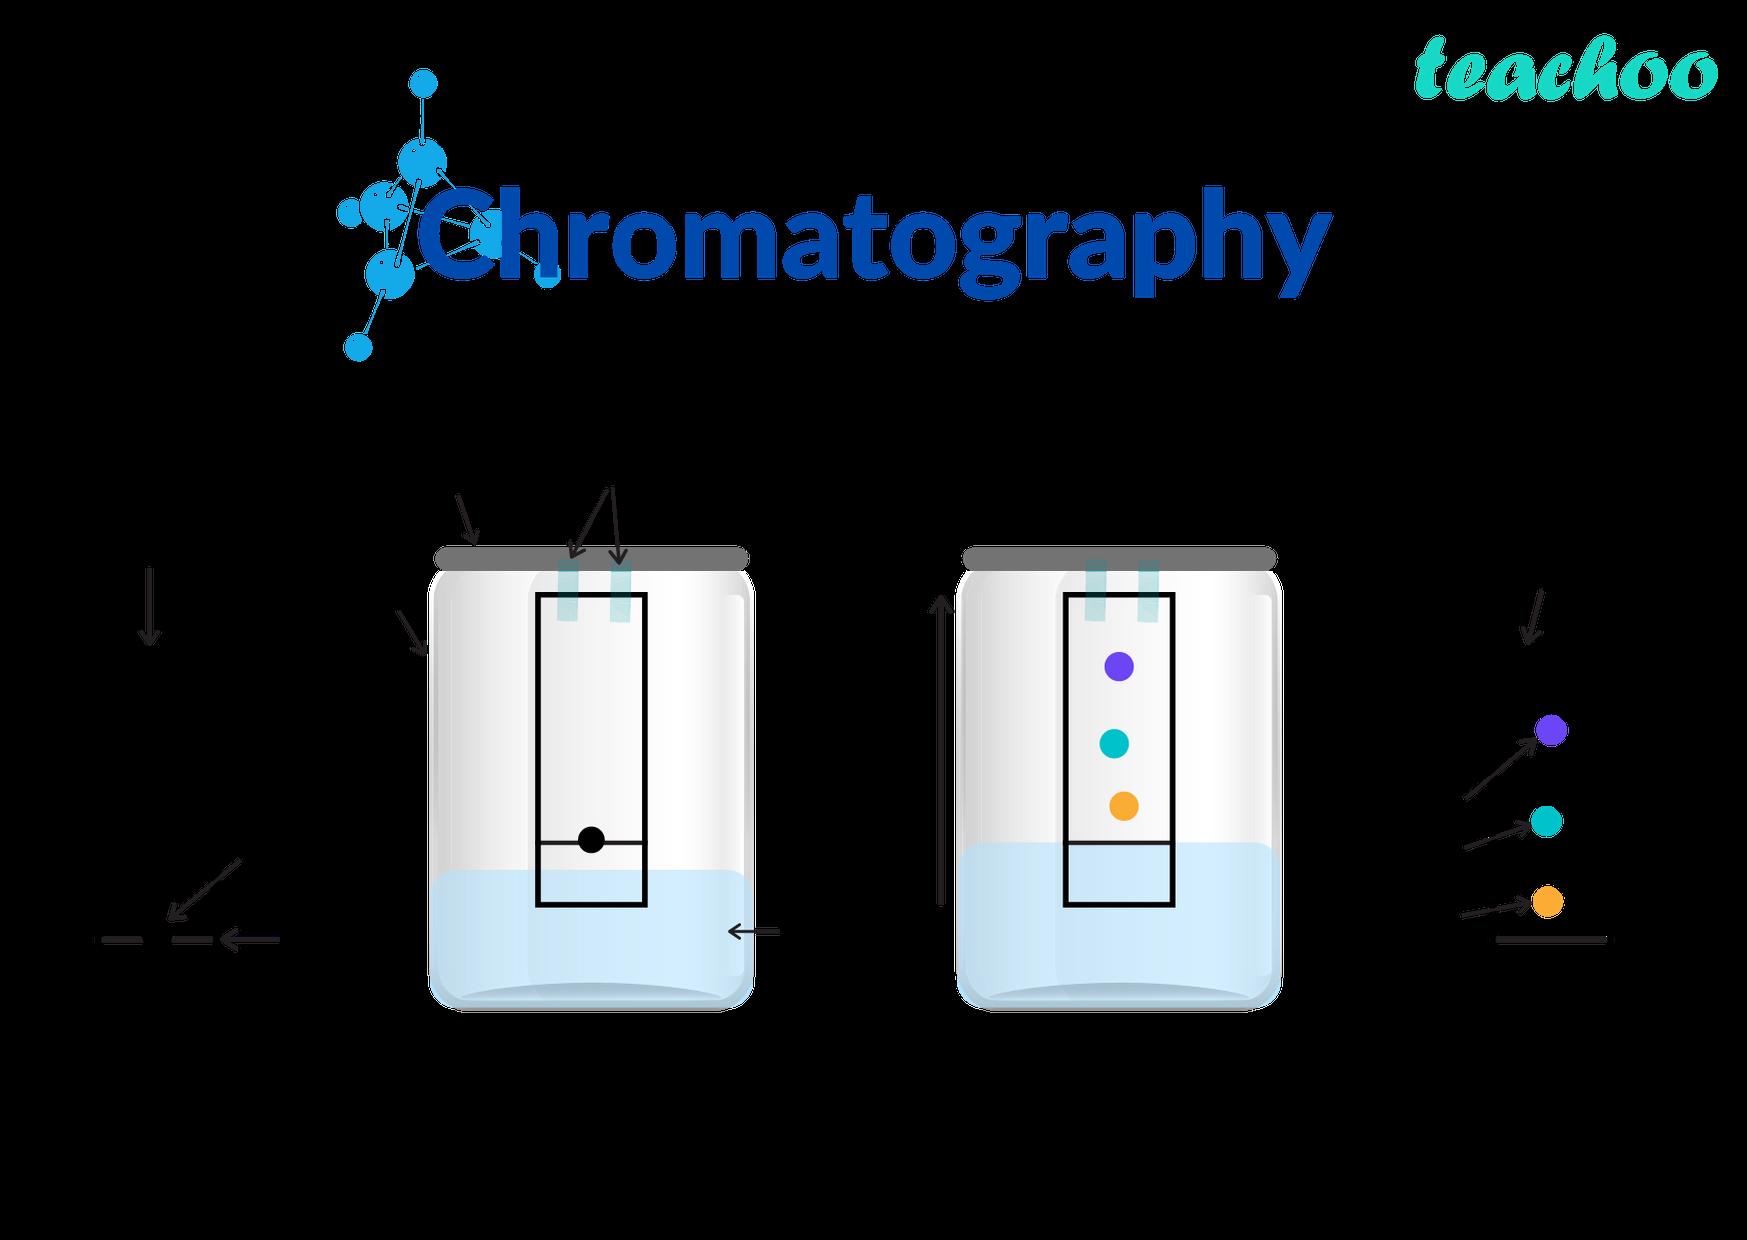 chromatography - Teachoo.png